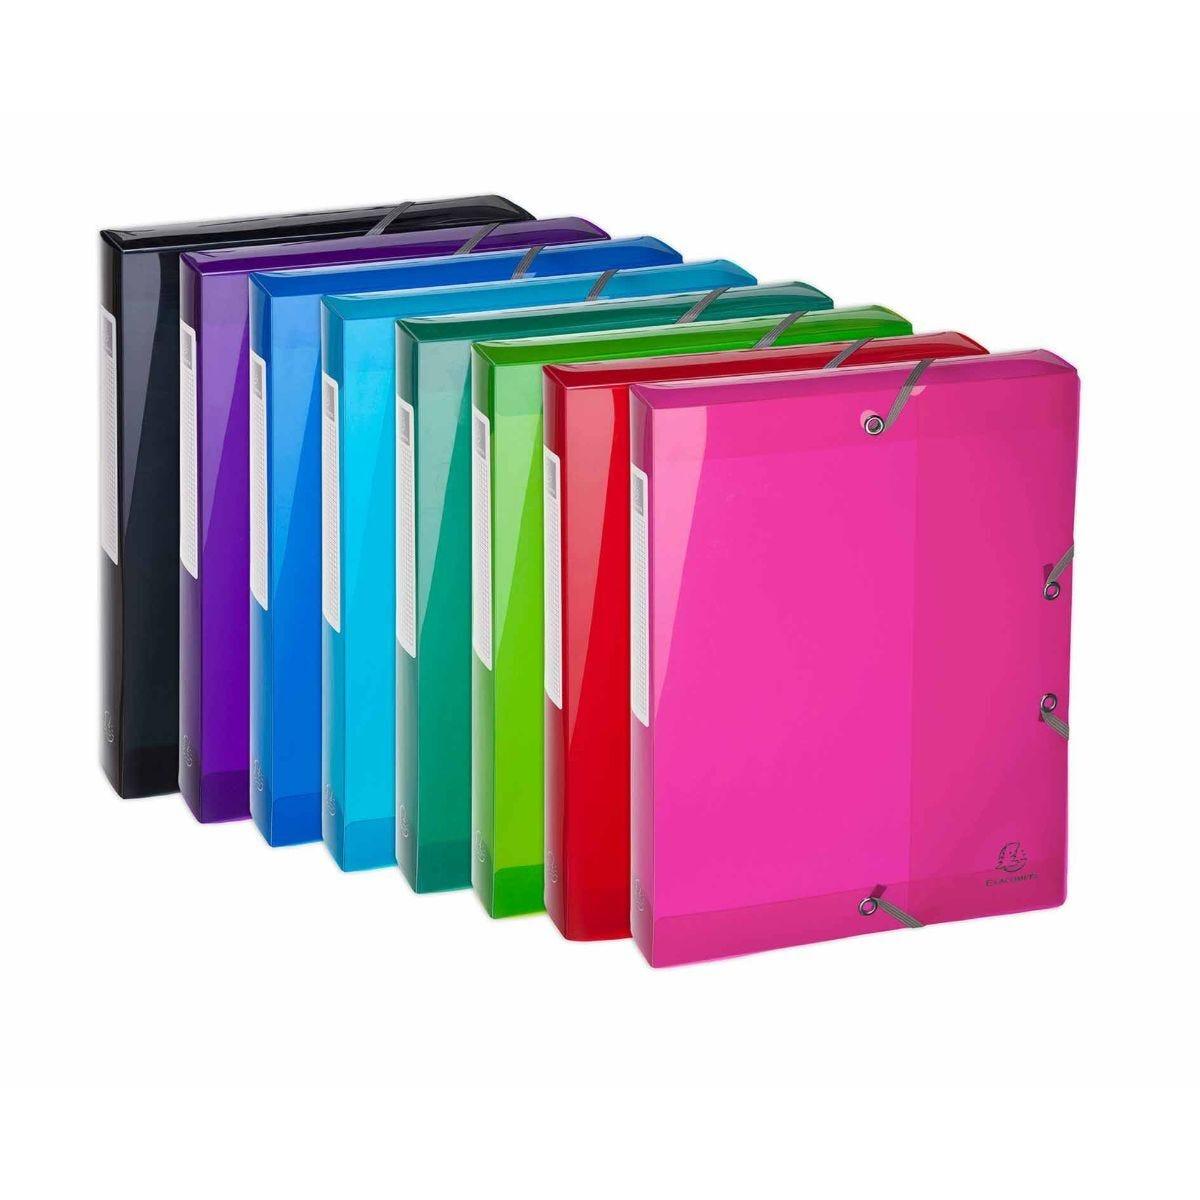 Exacompta Iderama Elastic Box File A4 Pack of 8 Assorted